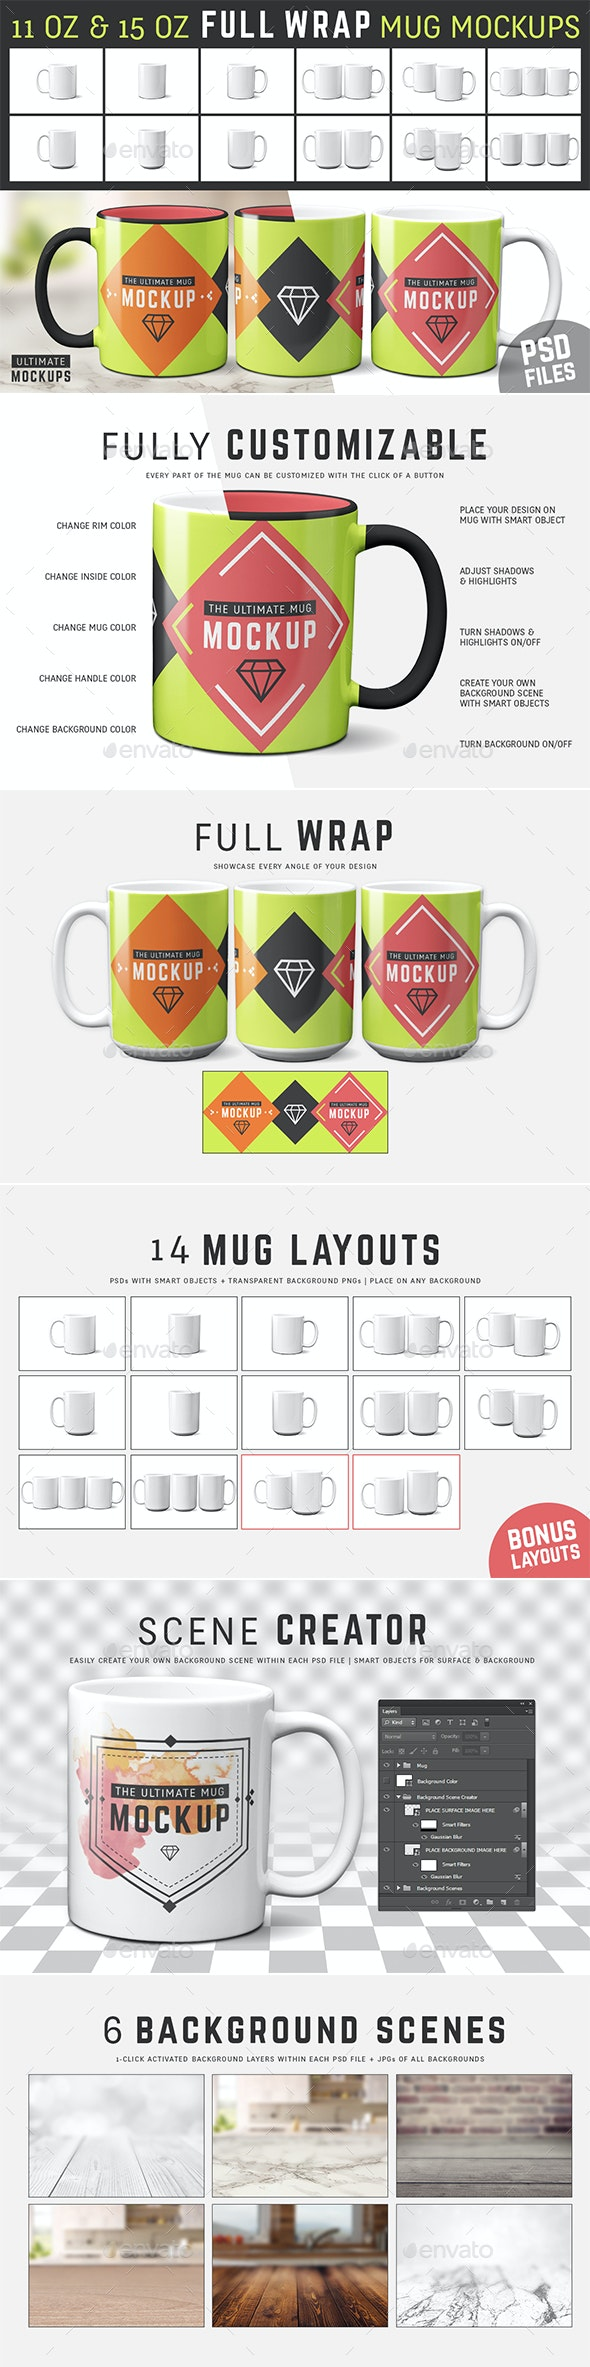 11 oz & 15 oz Full Wrap Mug Mockup Templates - Food and Drink Packaging